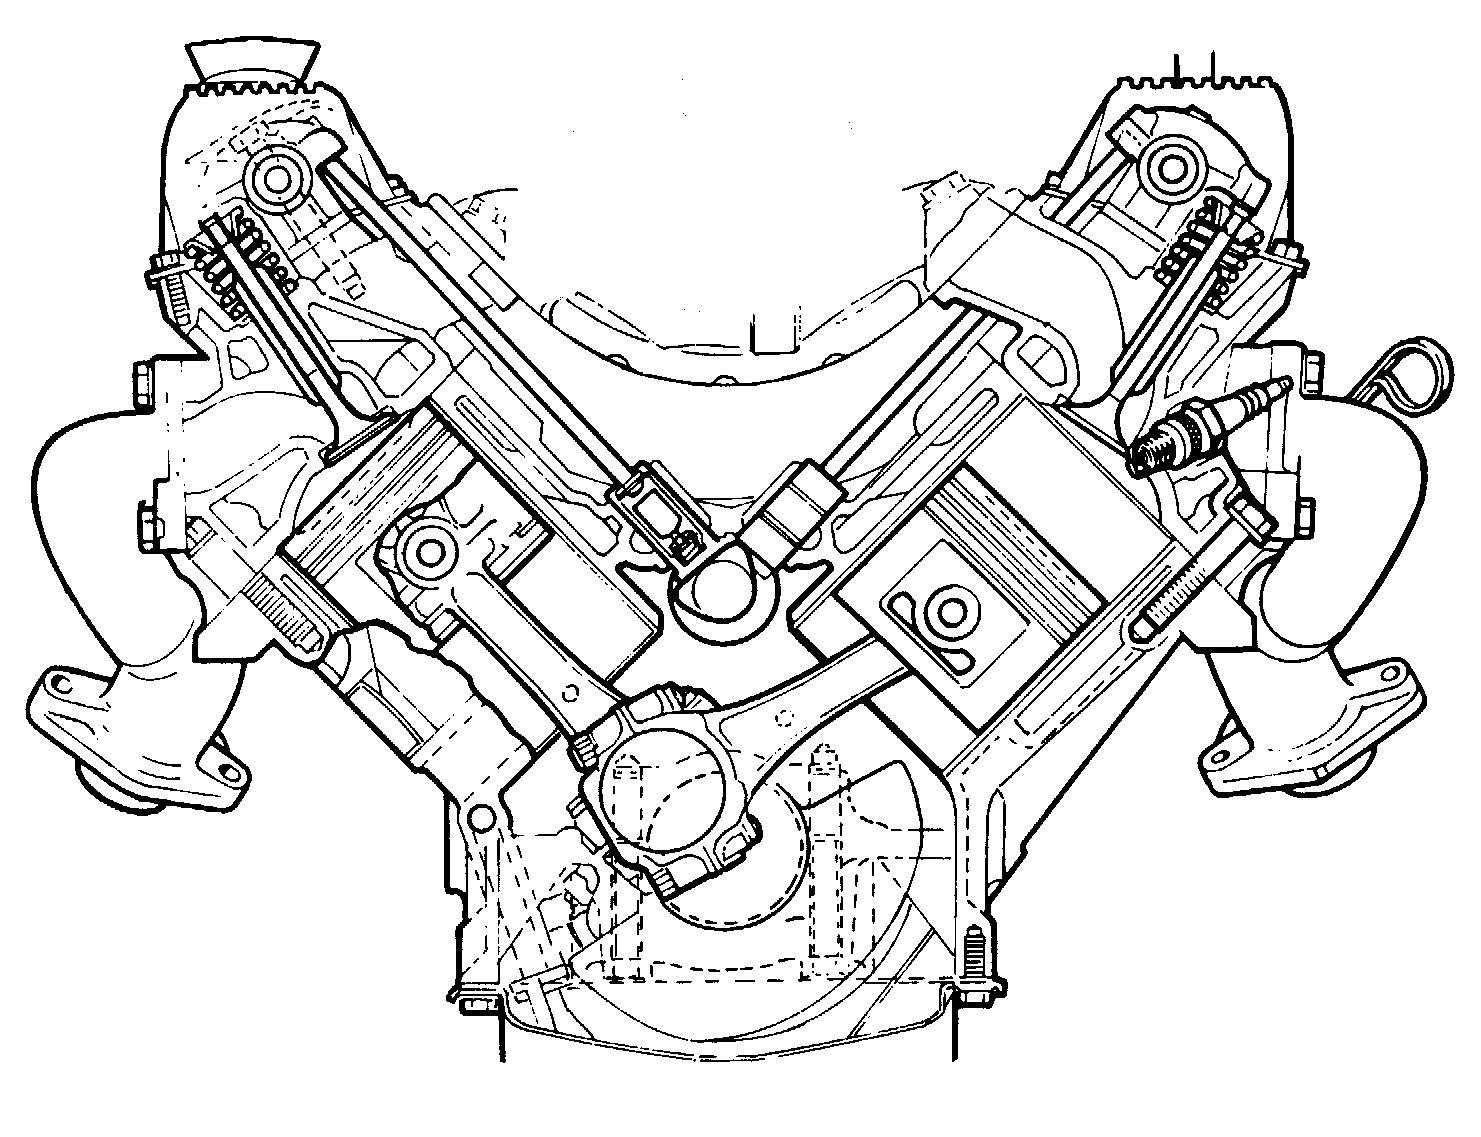 v8 engine exploded view diagram car, v8, free engine image ... rx 8 engine wiring harness diagram #15